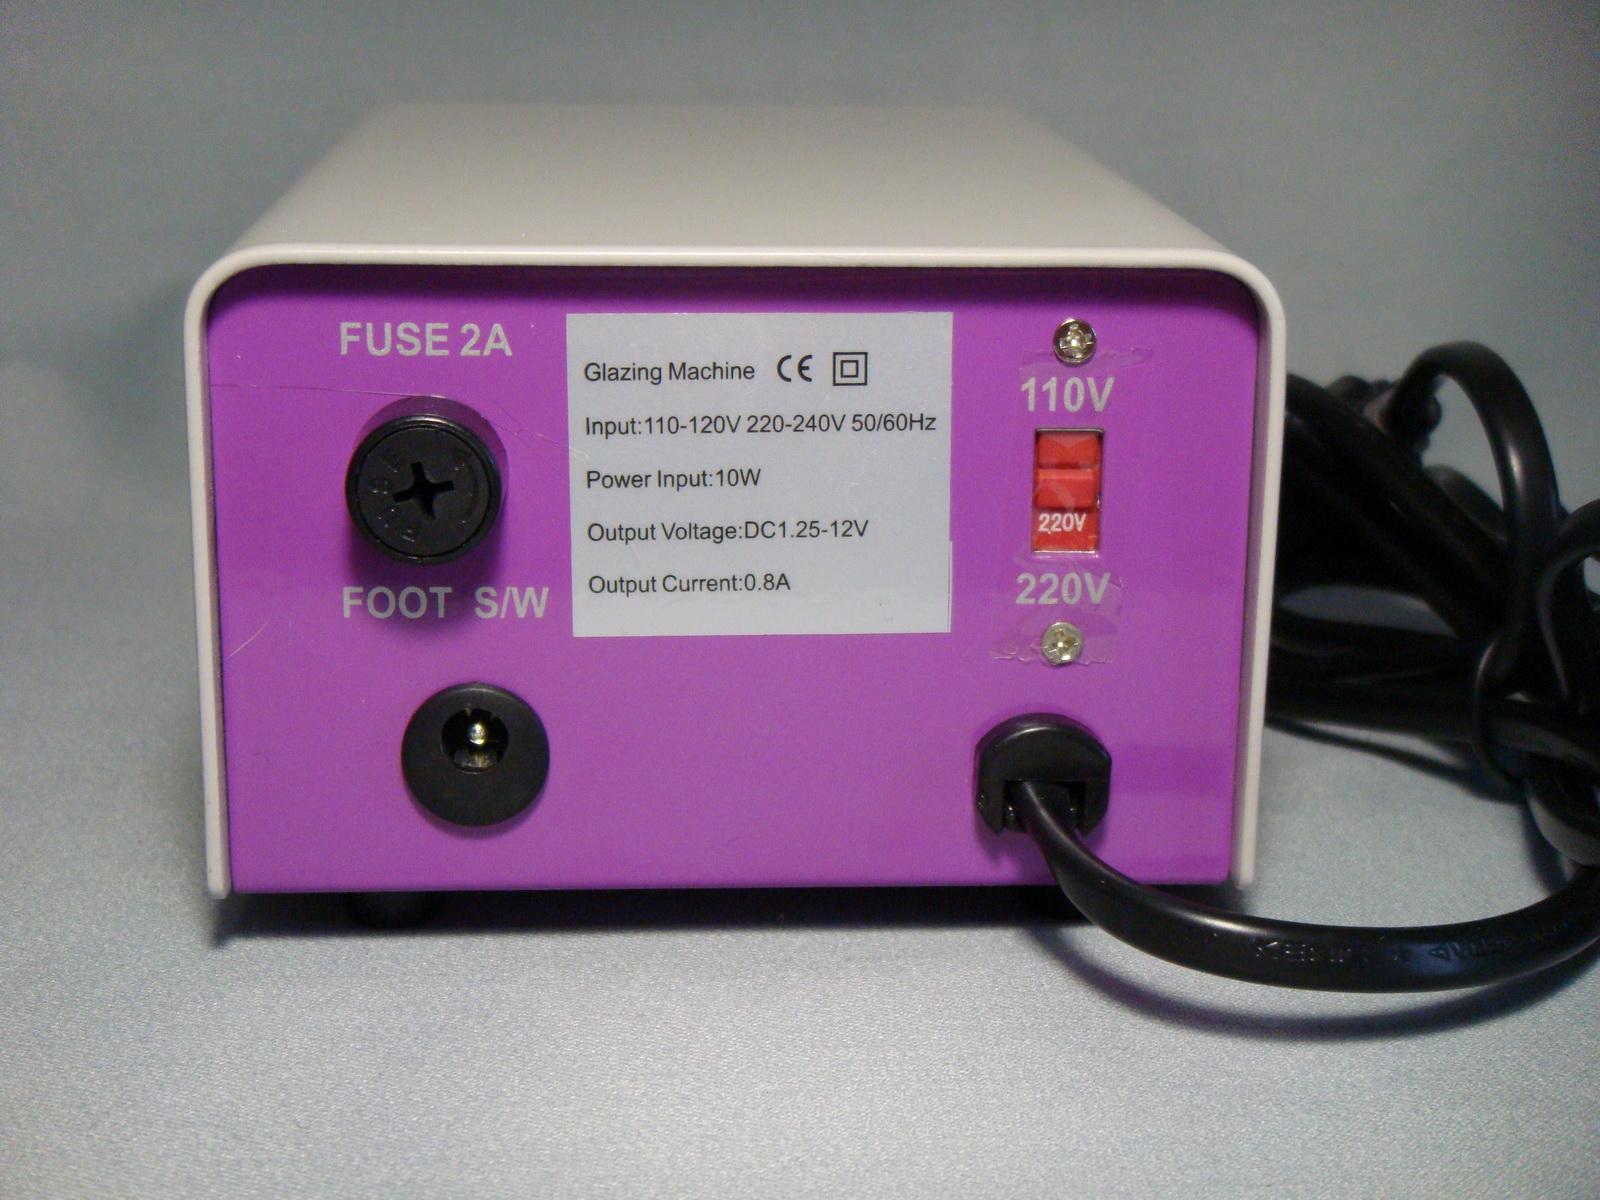 Lina фрейзер мм2500 схема ремонт